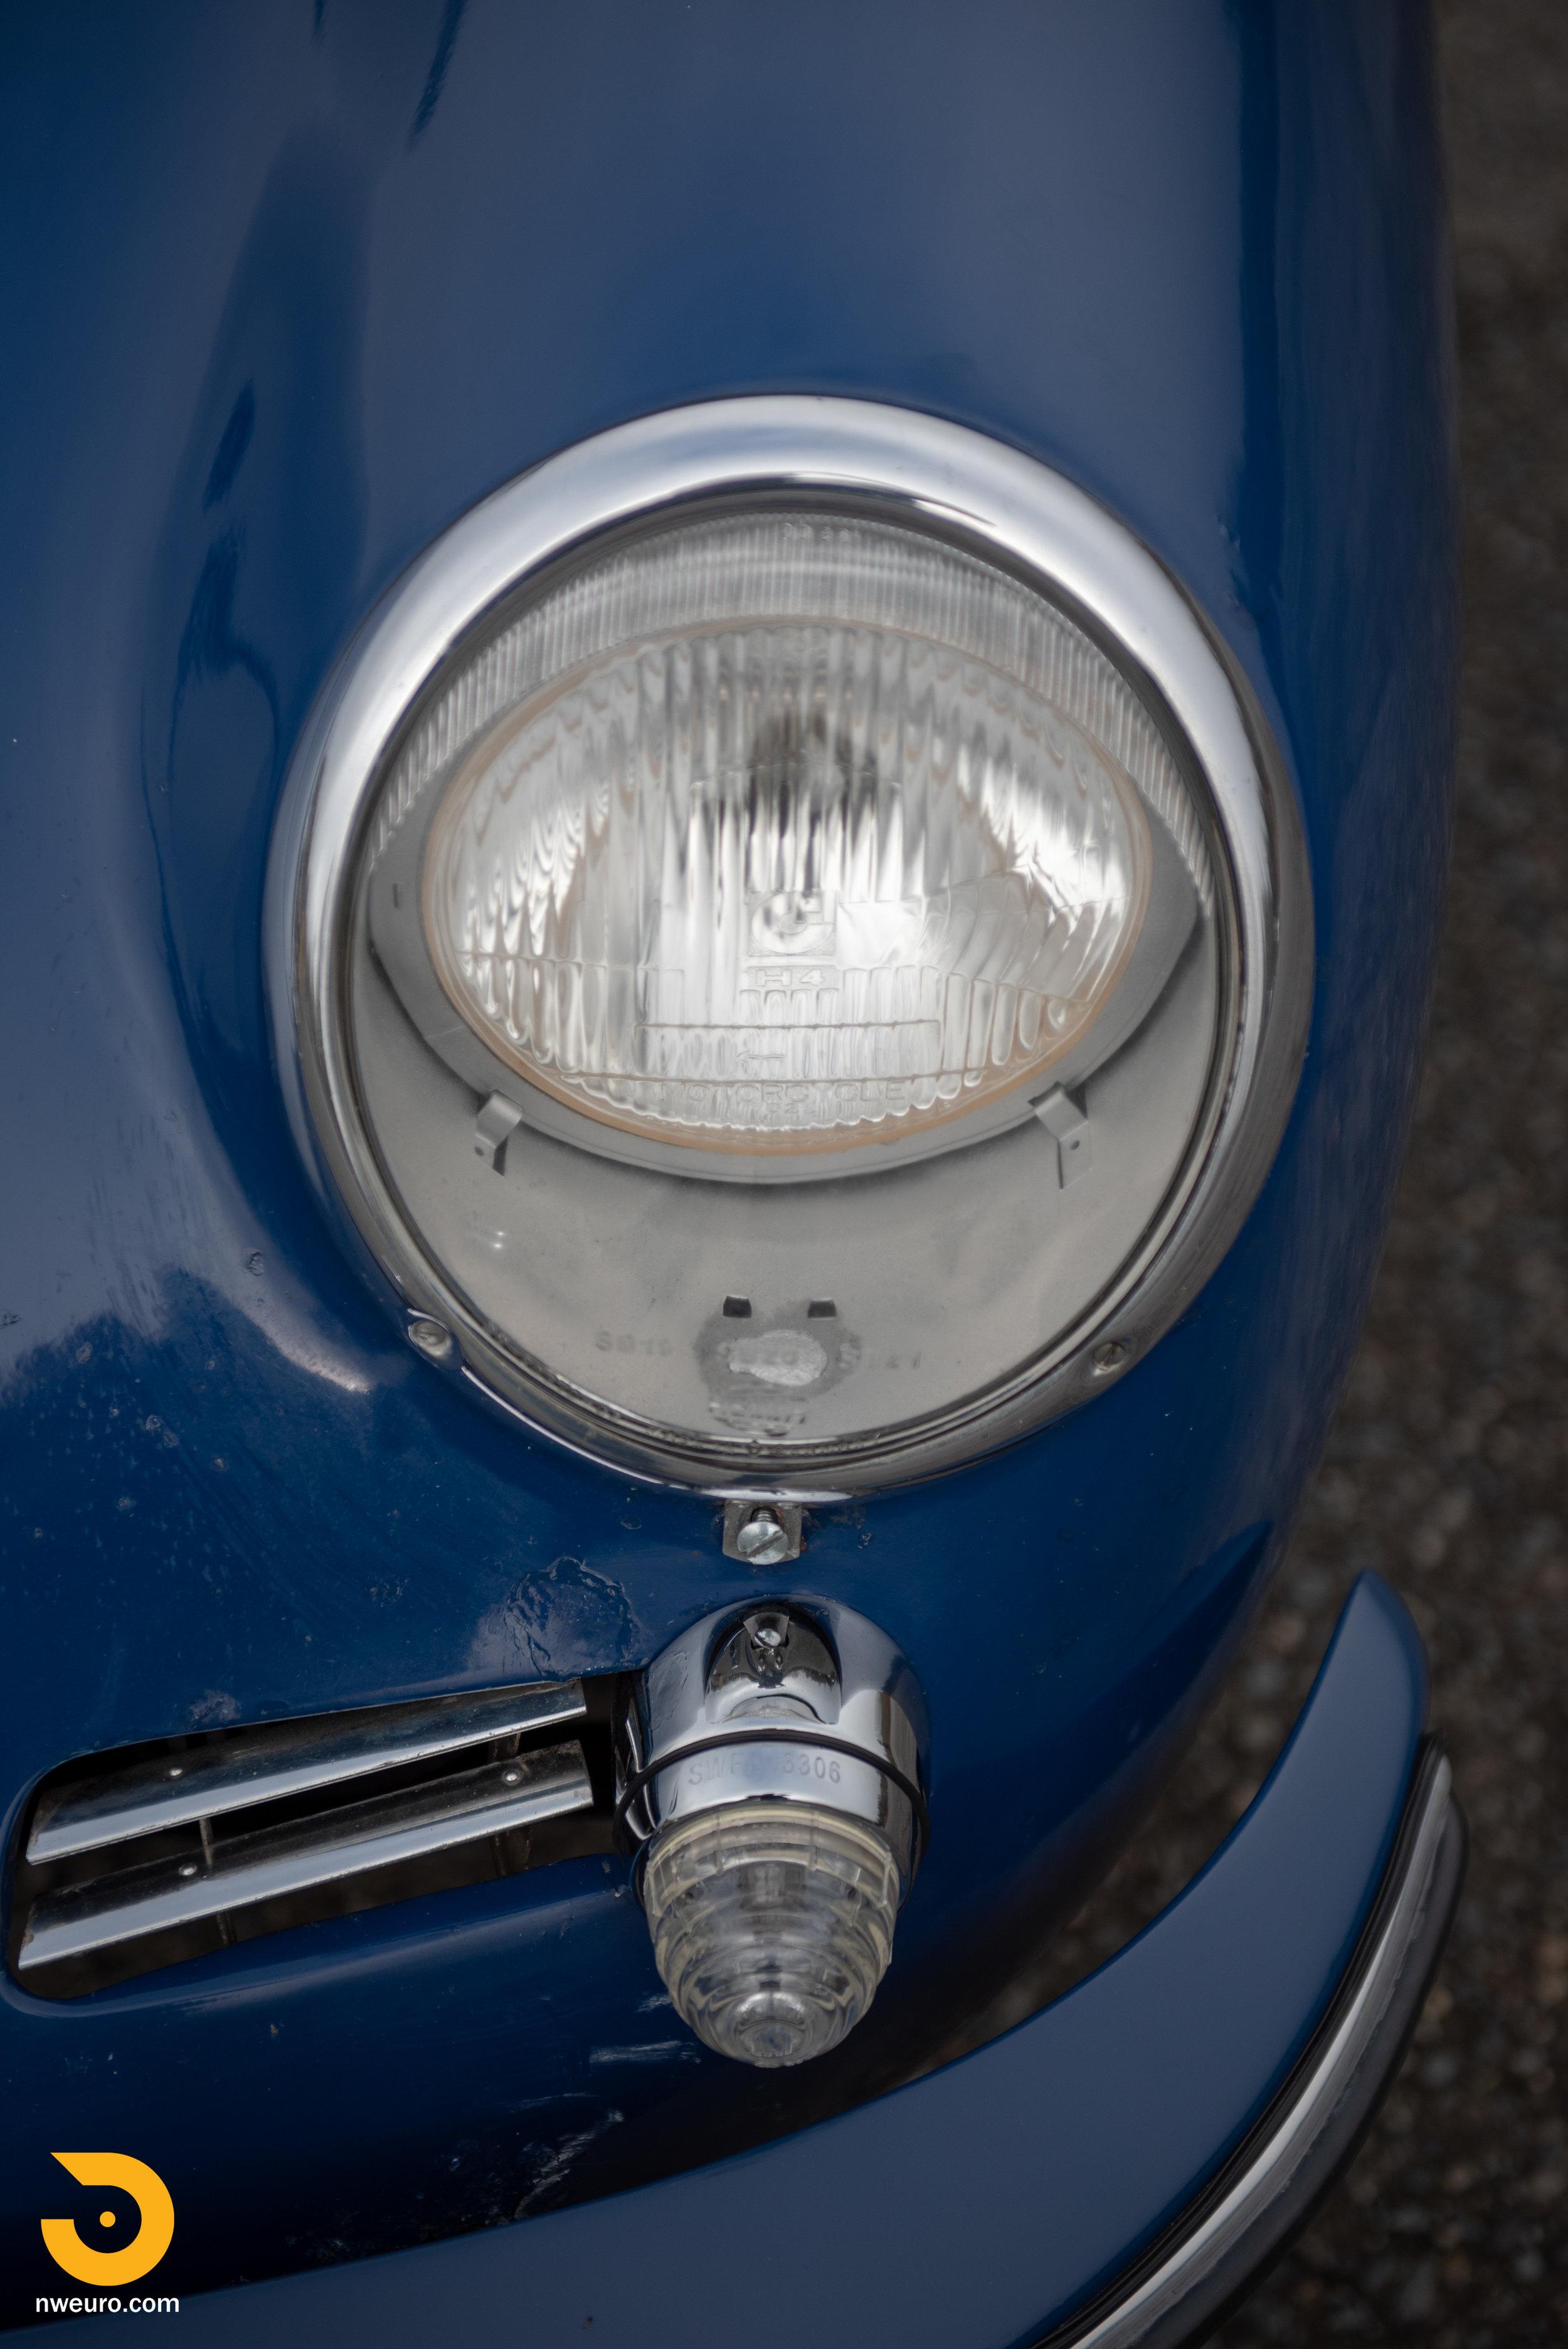 1960 Porsche 356 Hardtop Cab 1600 Super-24.jpg